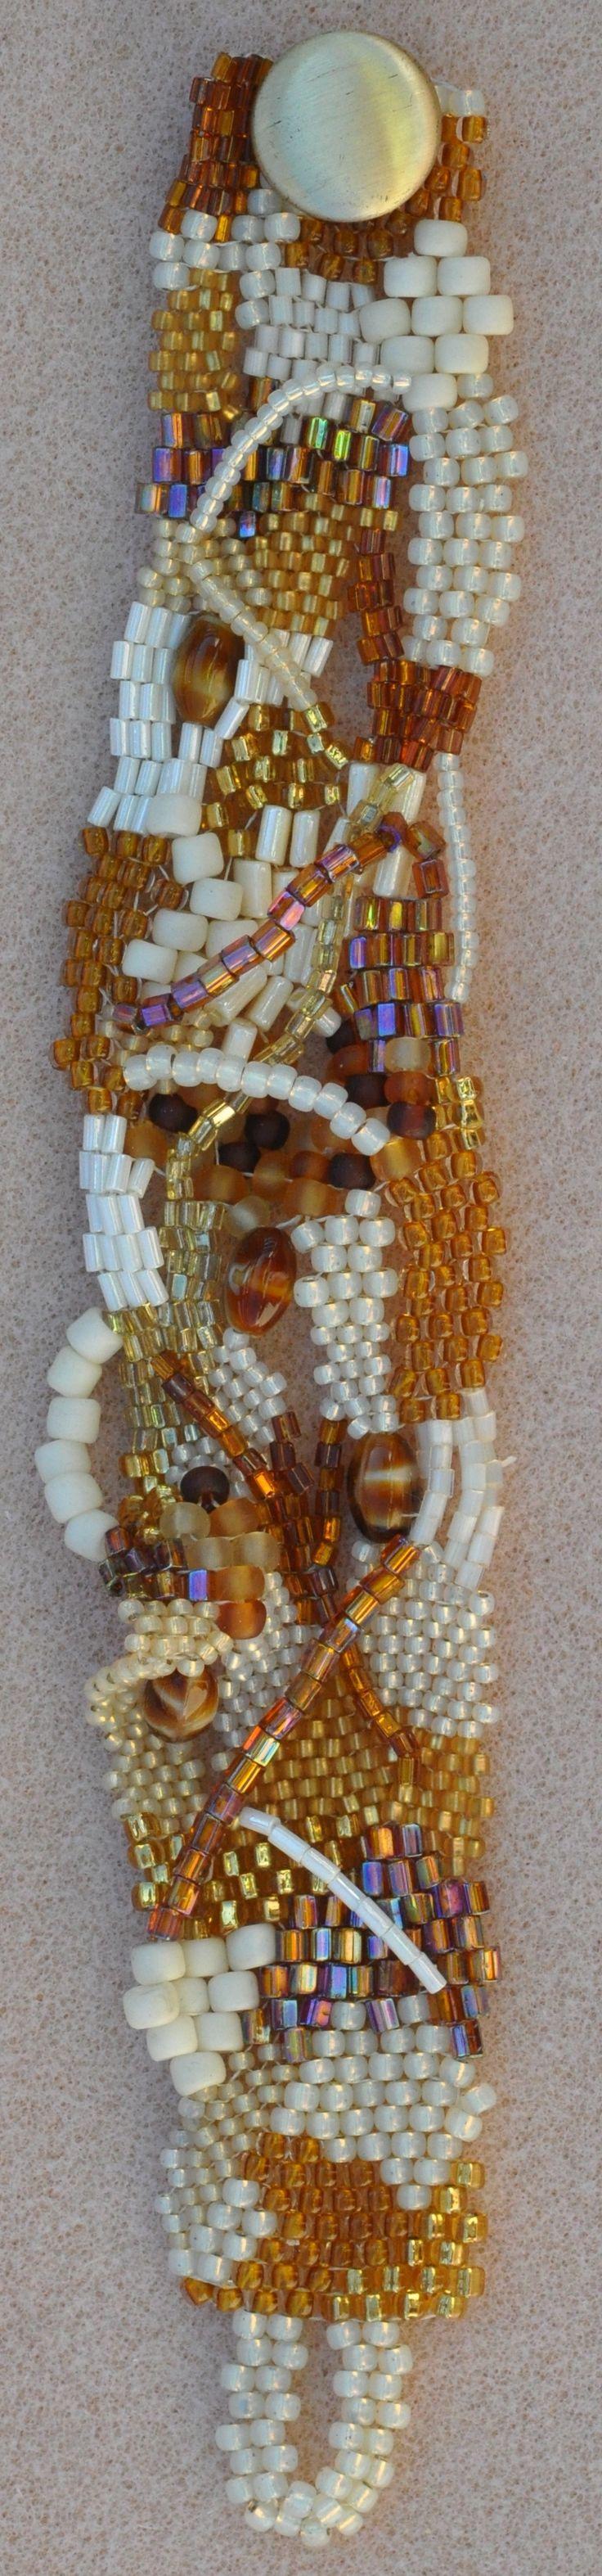 Hand Made Biege Freeform Peyote Beaded Bracelet